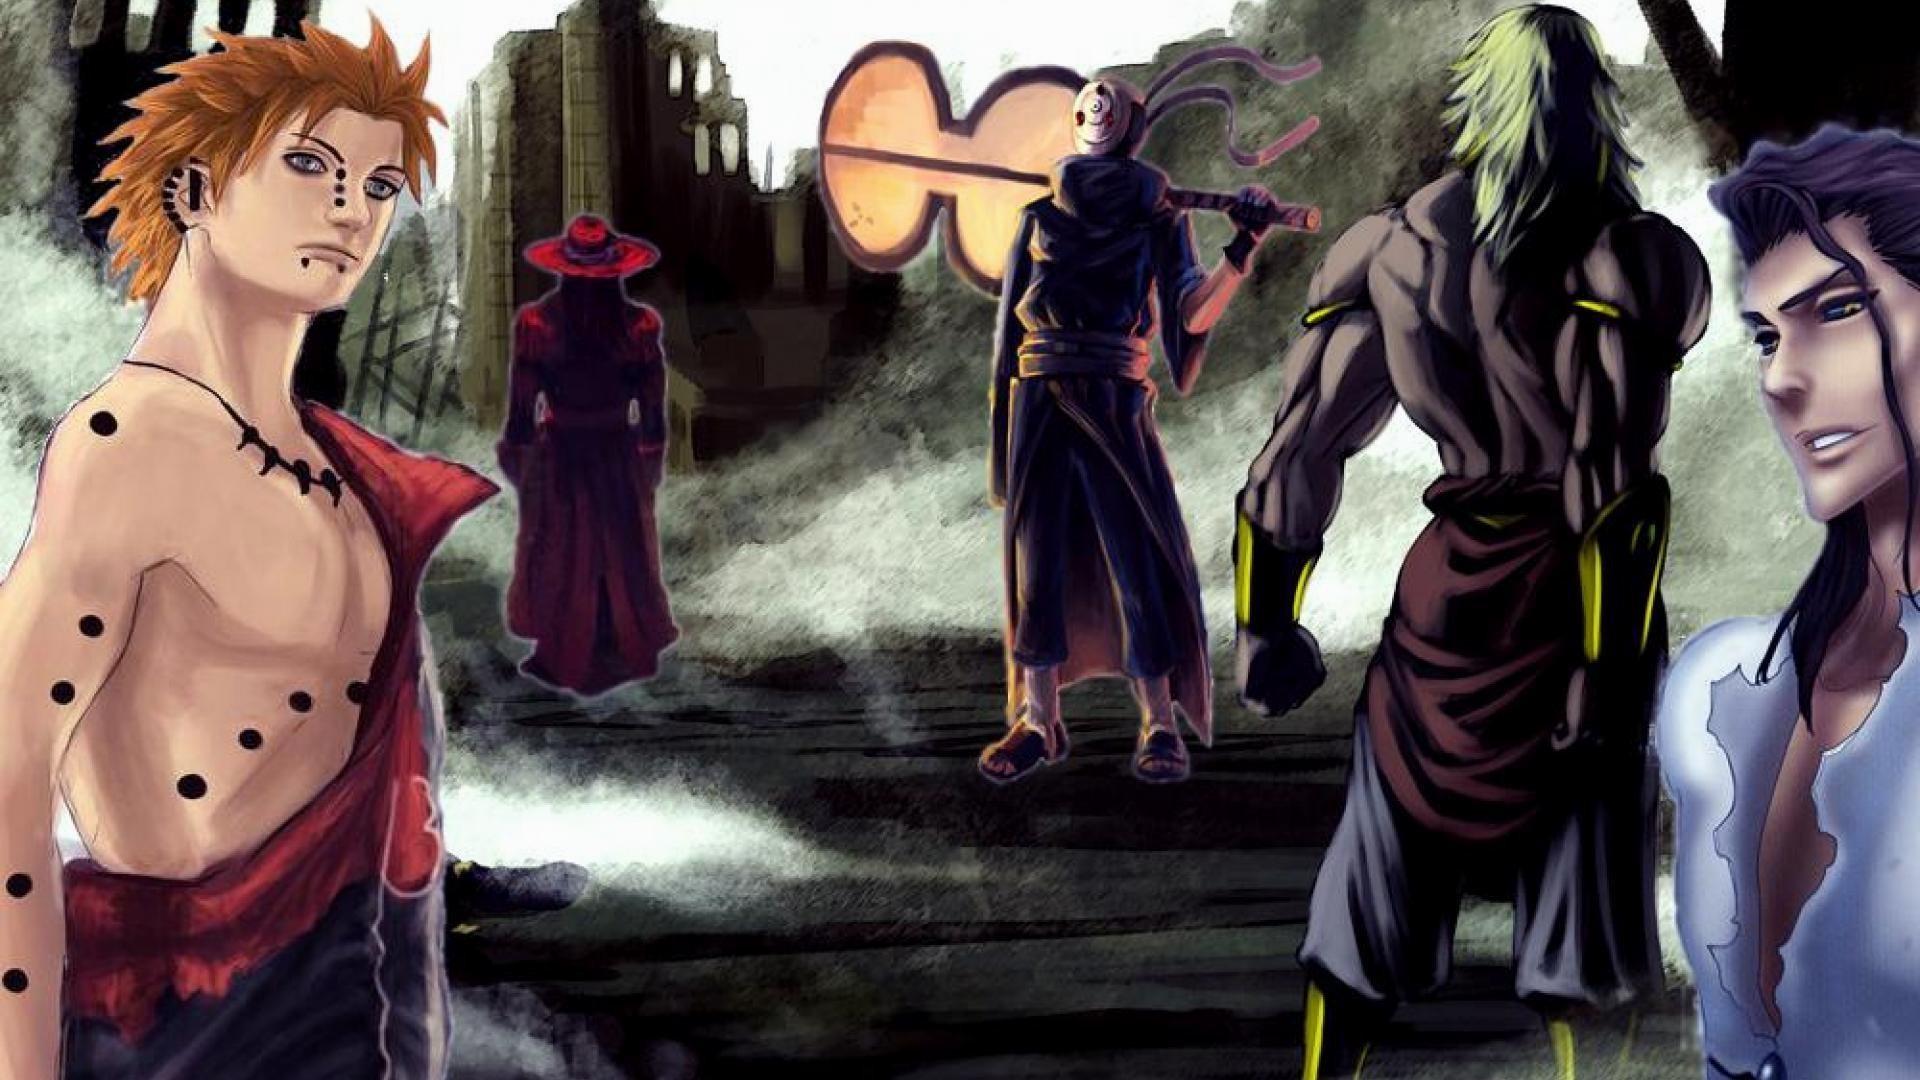 wallpaper.wiki-Badass-Anime-Background-for-Desktop-PIC-